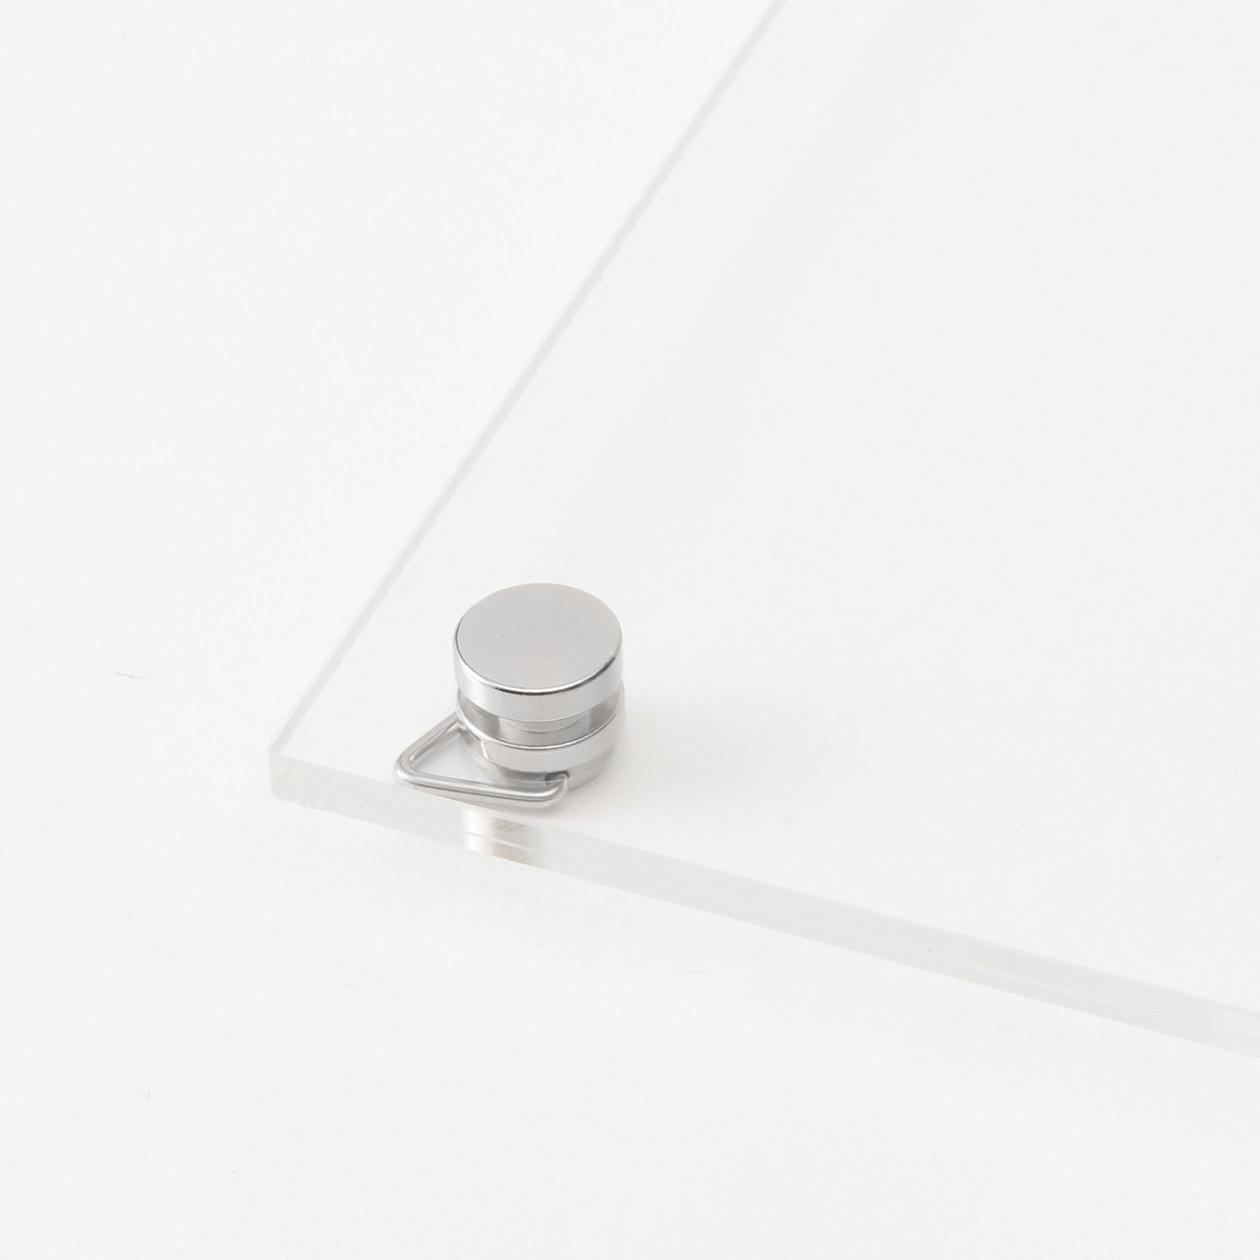 acrylic frame with wire muji - Muji Frames